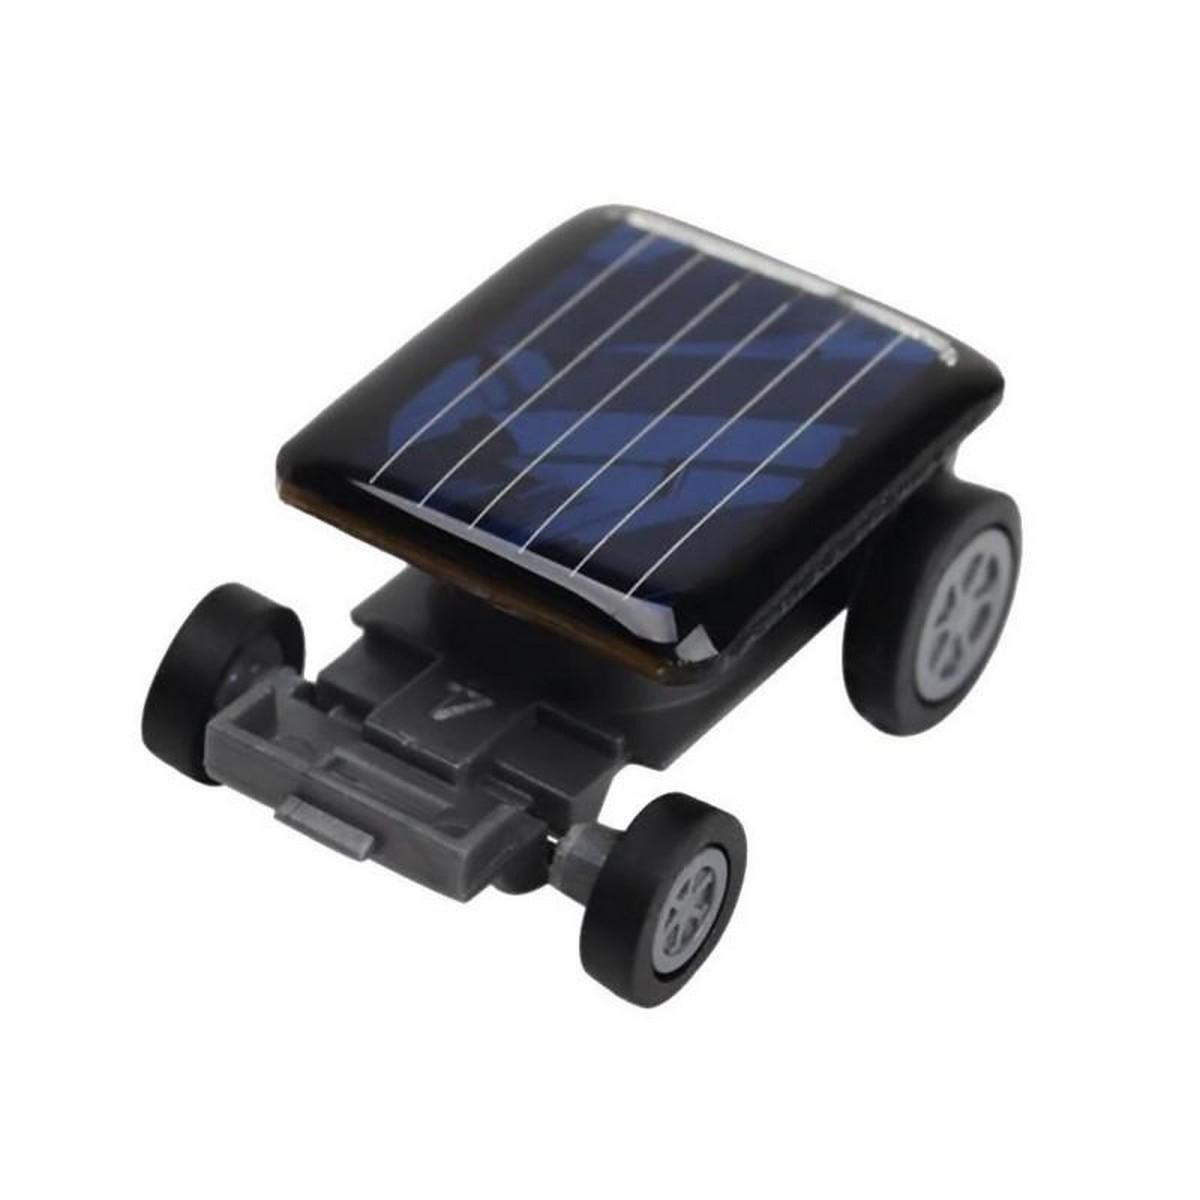 Smallest Mini Car Solar Power Educational Toy Hot Selling